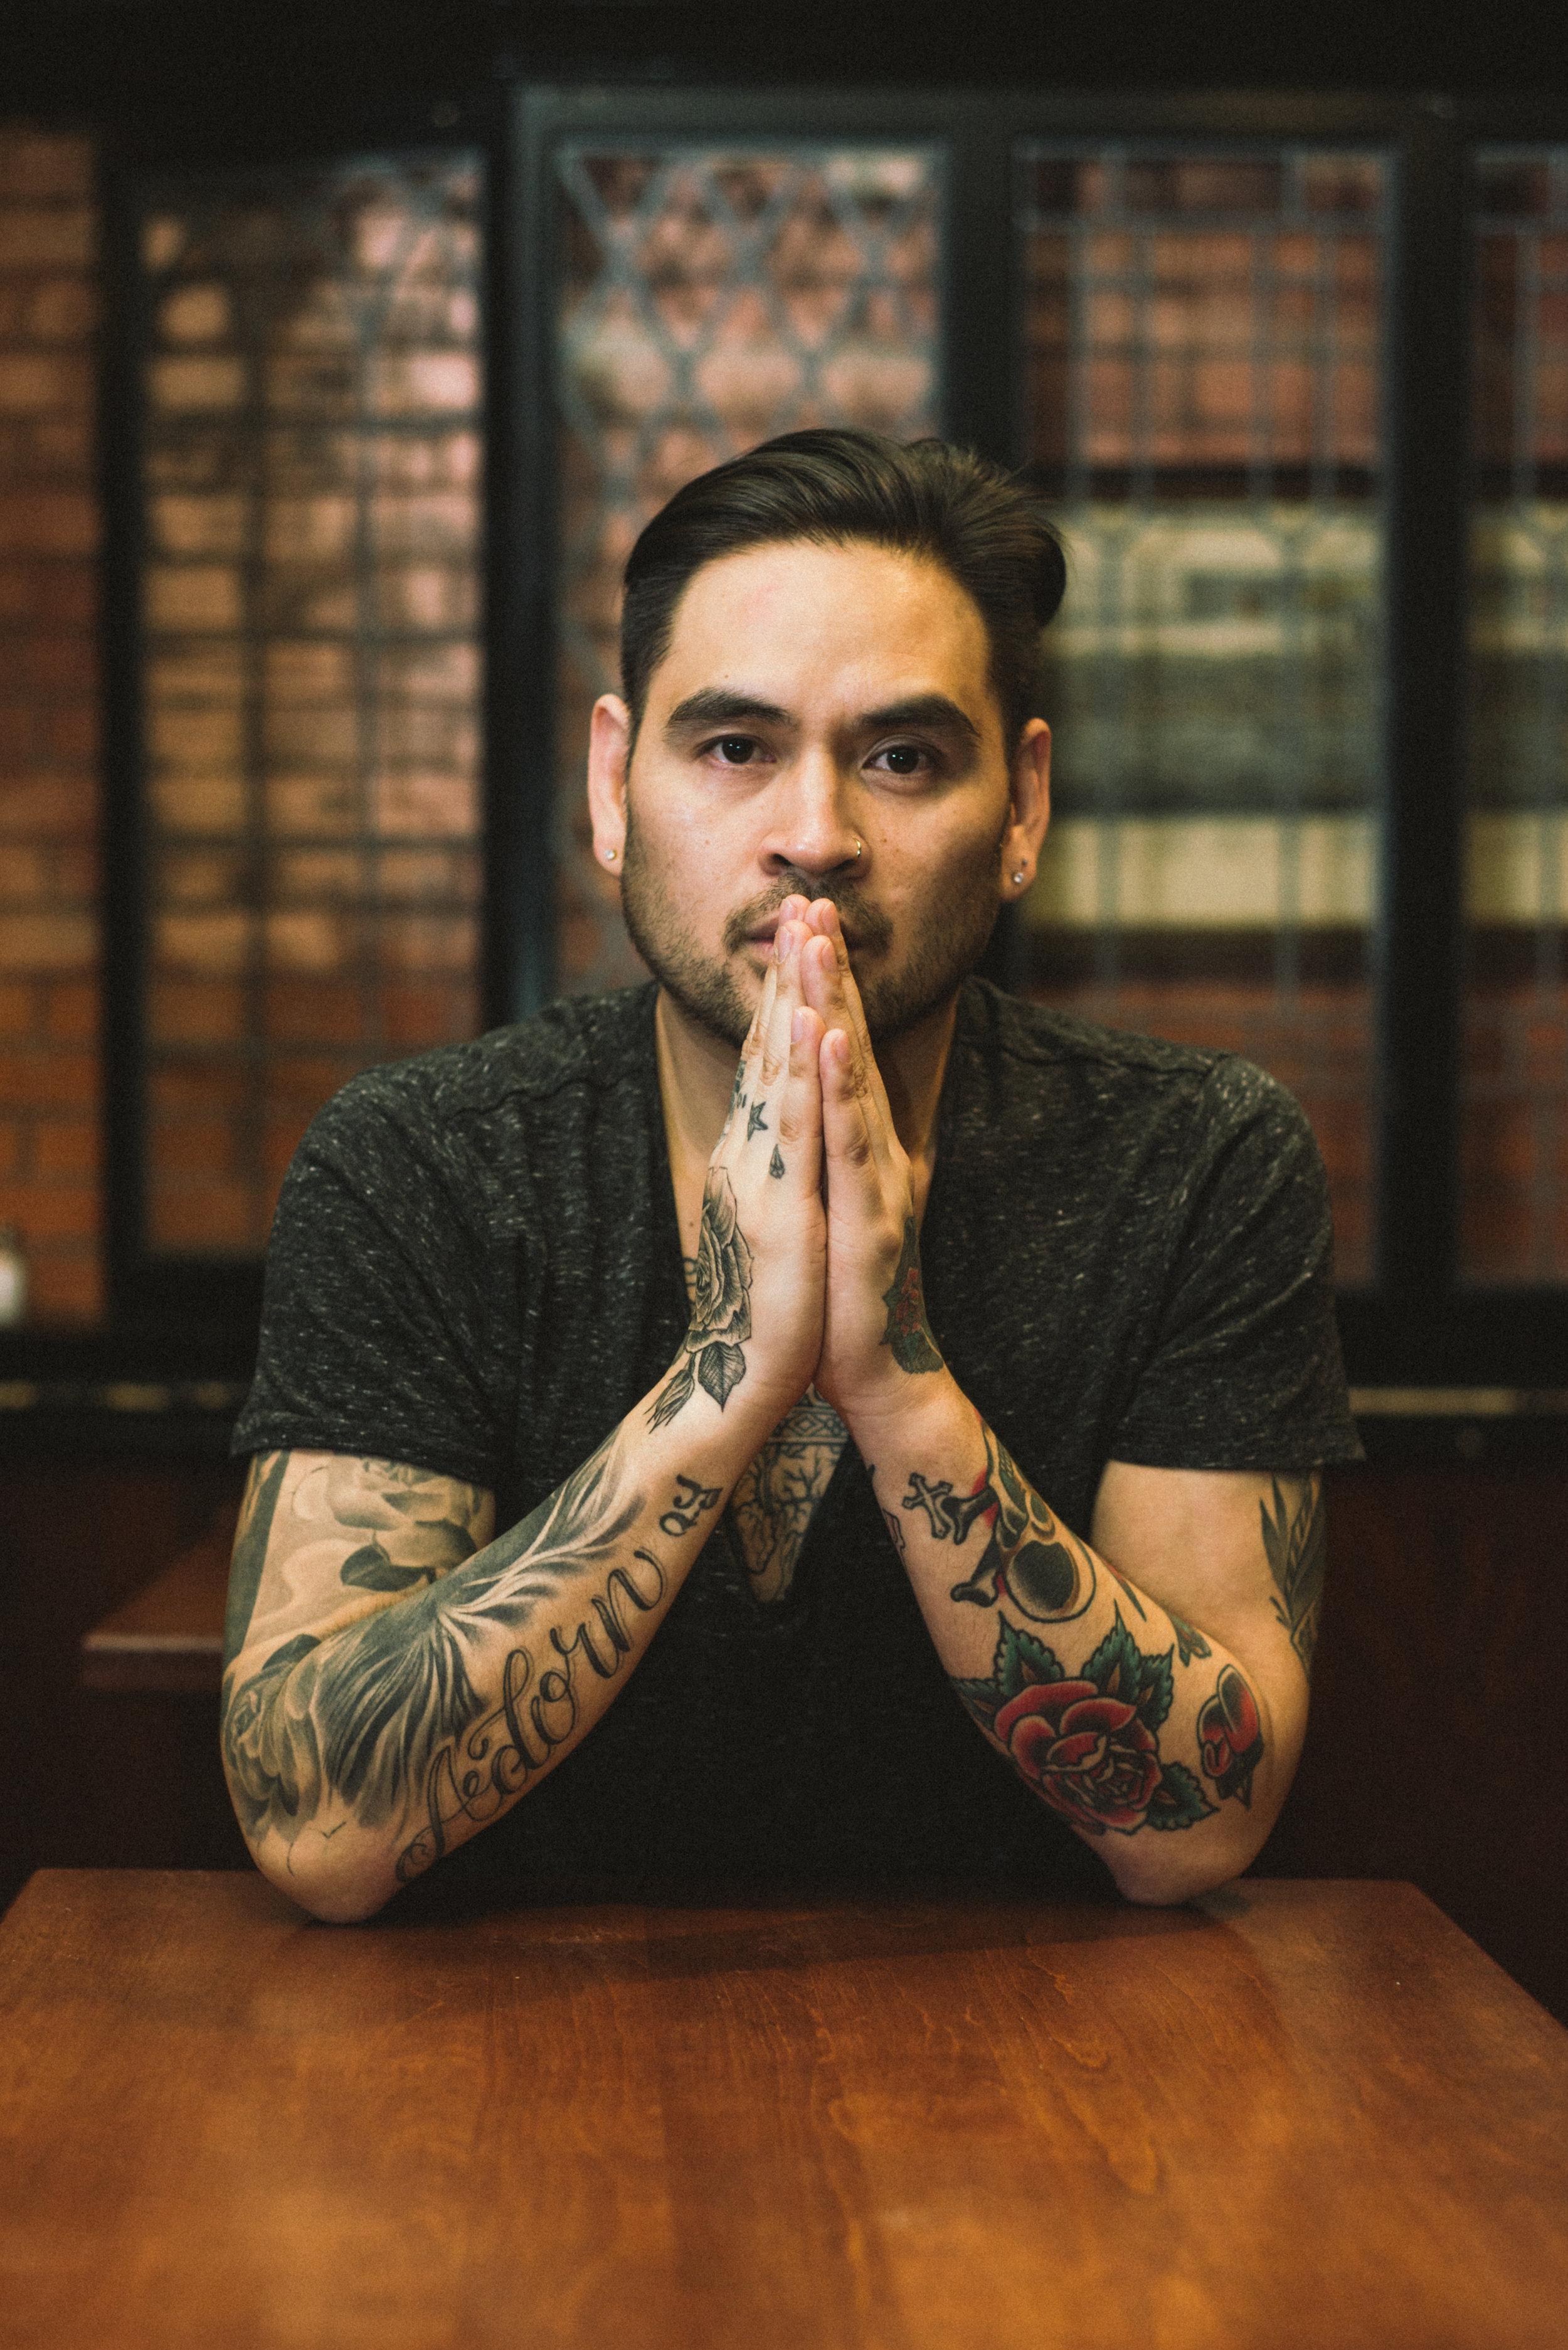 SUYT-Tattoo-Toronto-Adrenaline-Kris-Perez-Scandaleuse-3